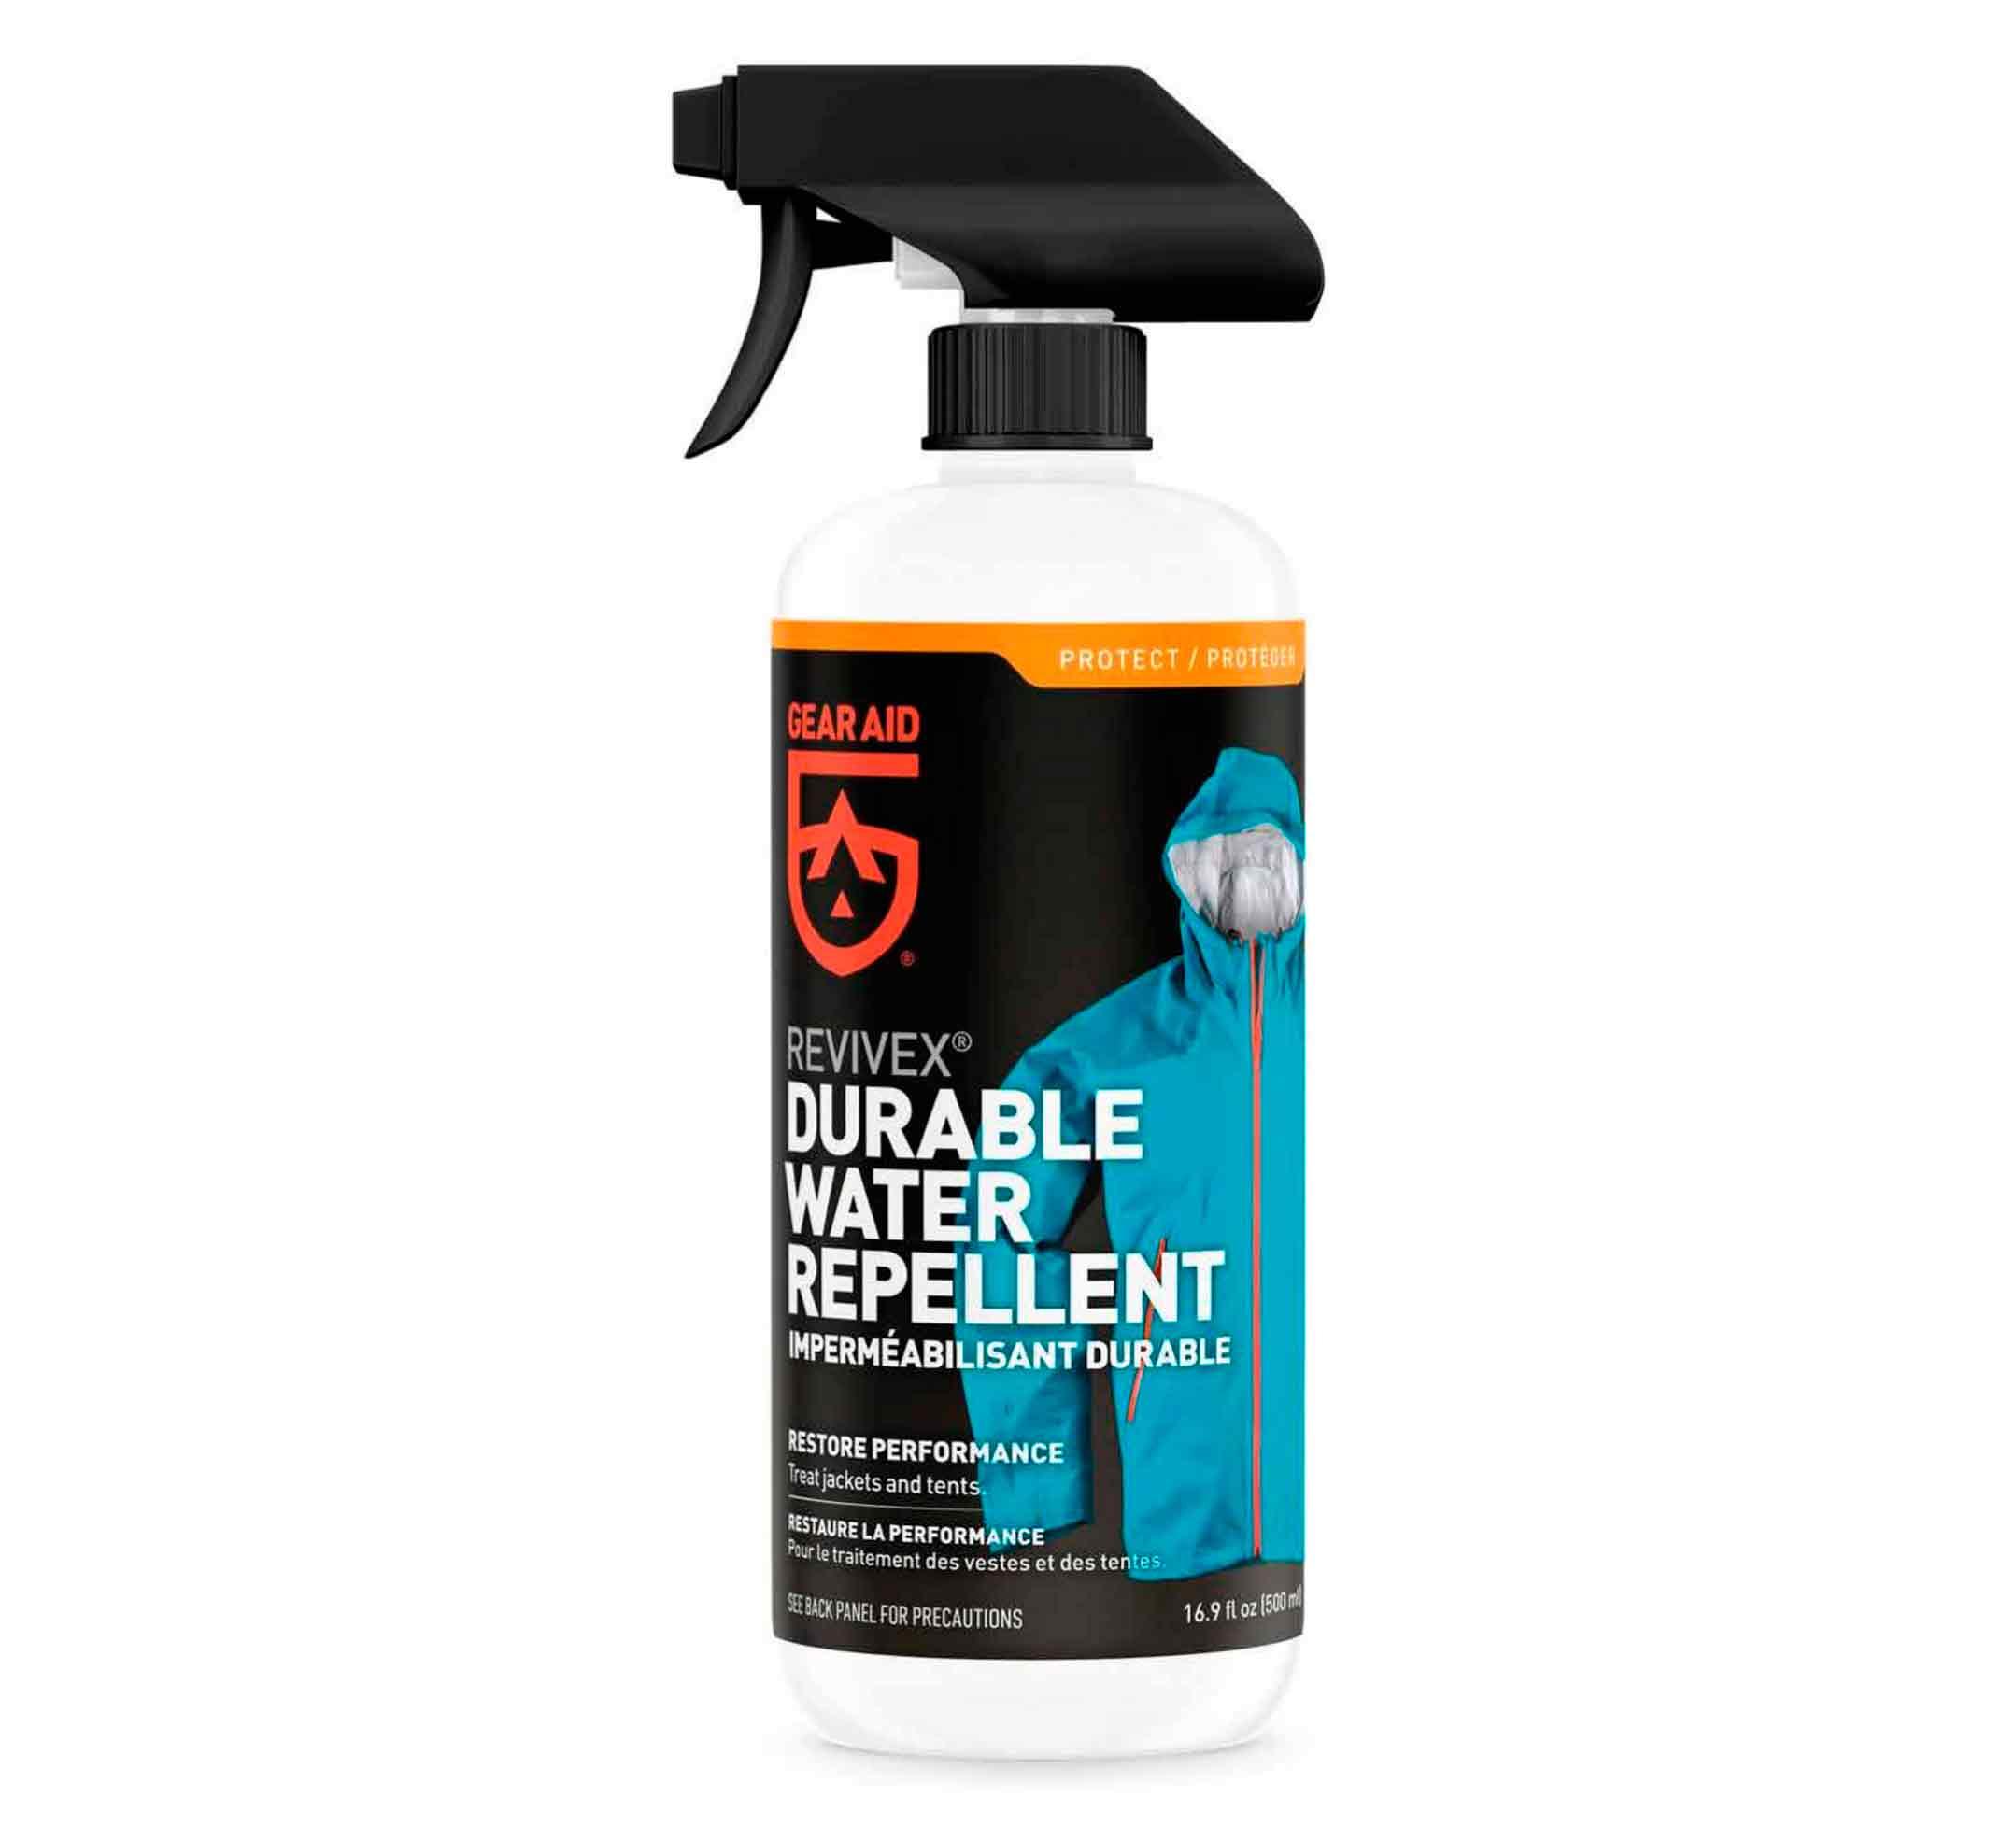 REPELENTE-REVIVEX-Durable-Water-Repellent